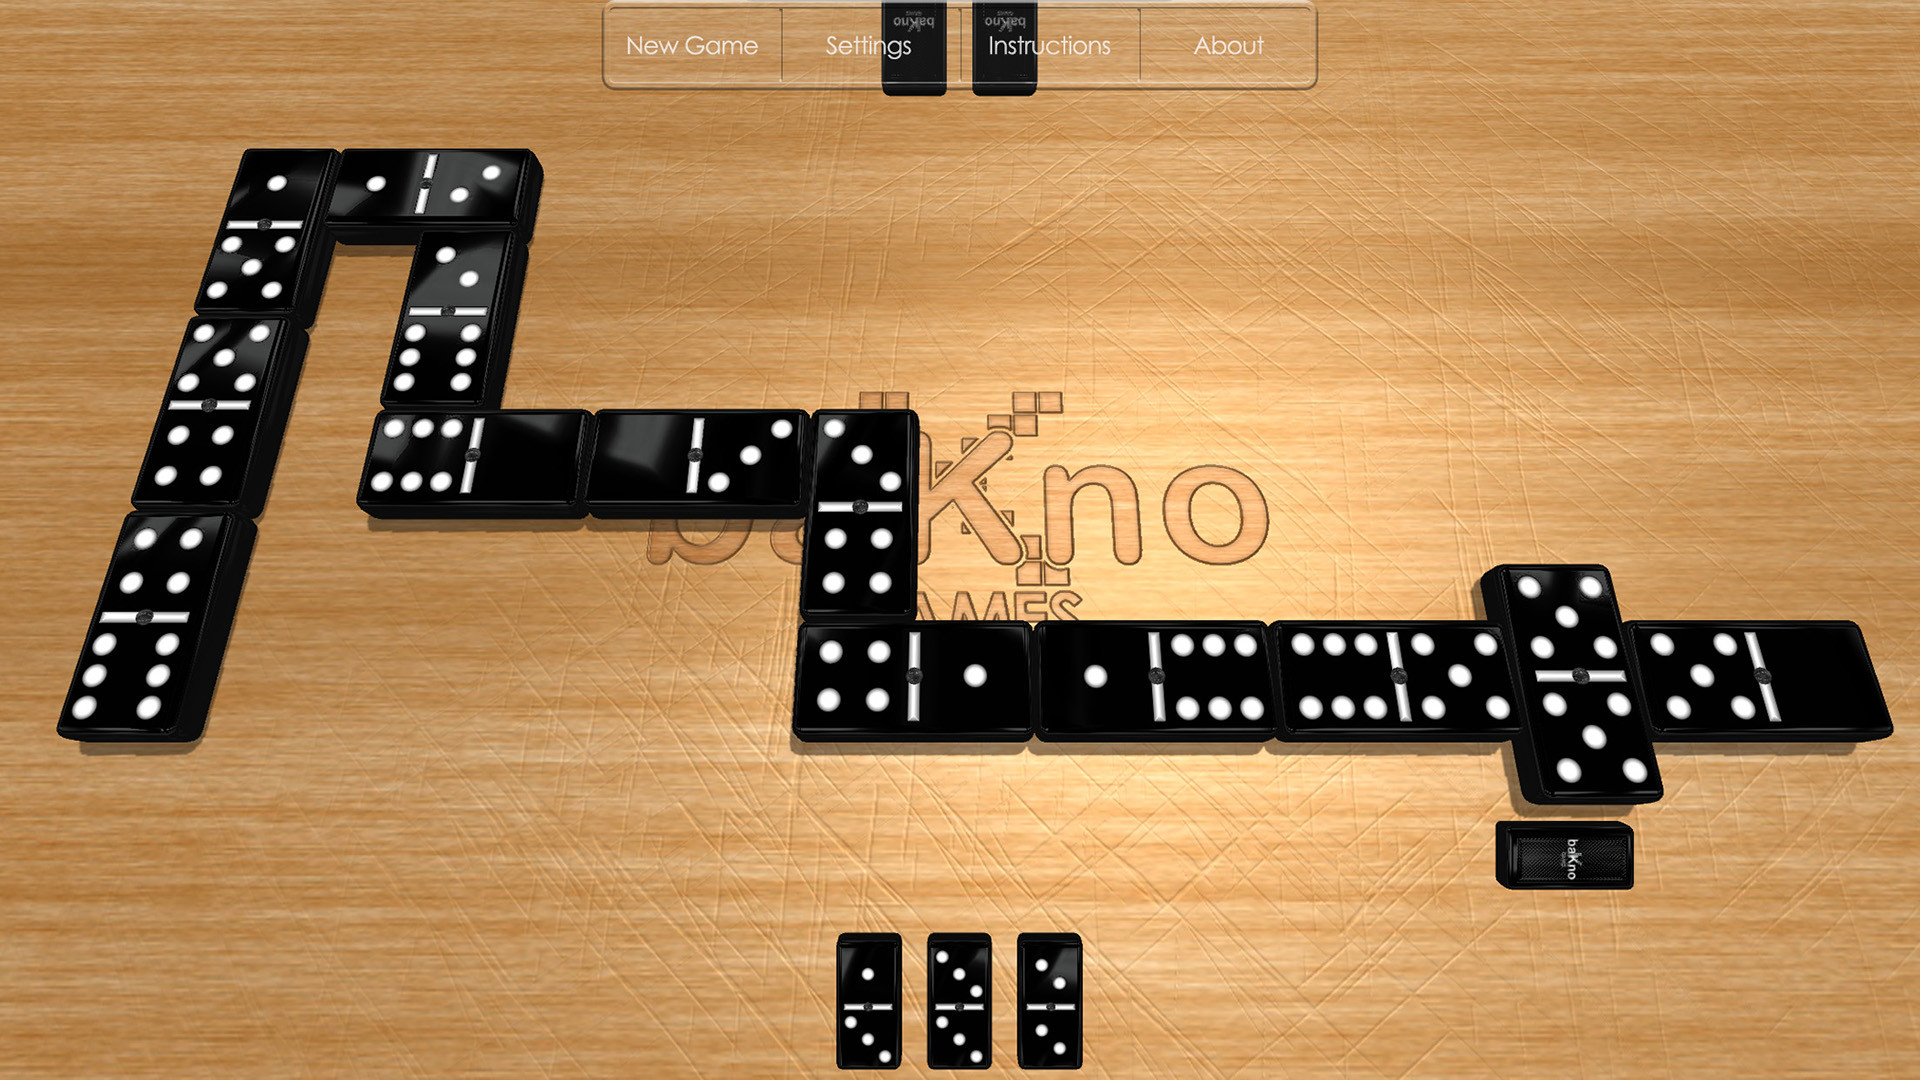 Domino ponostar, sexteen core